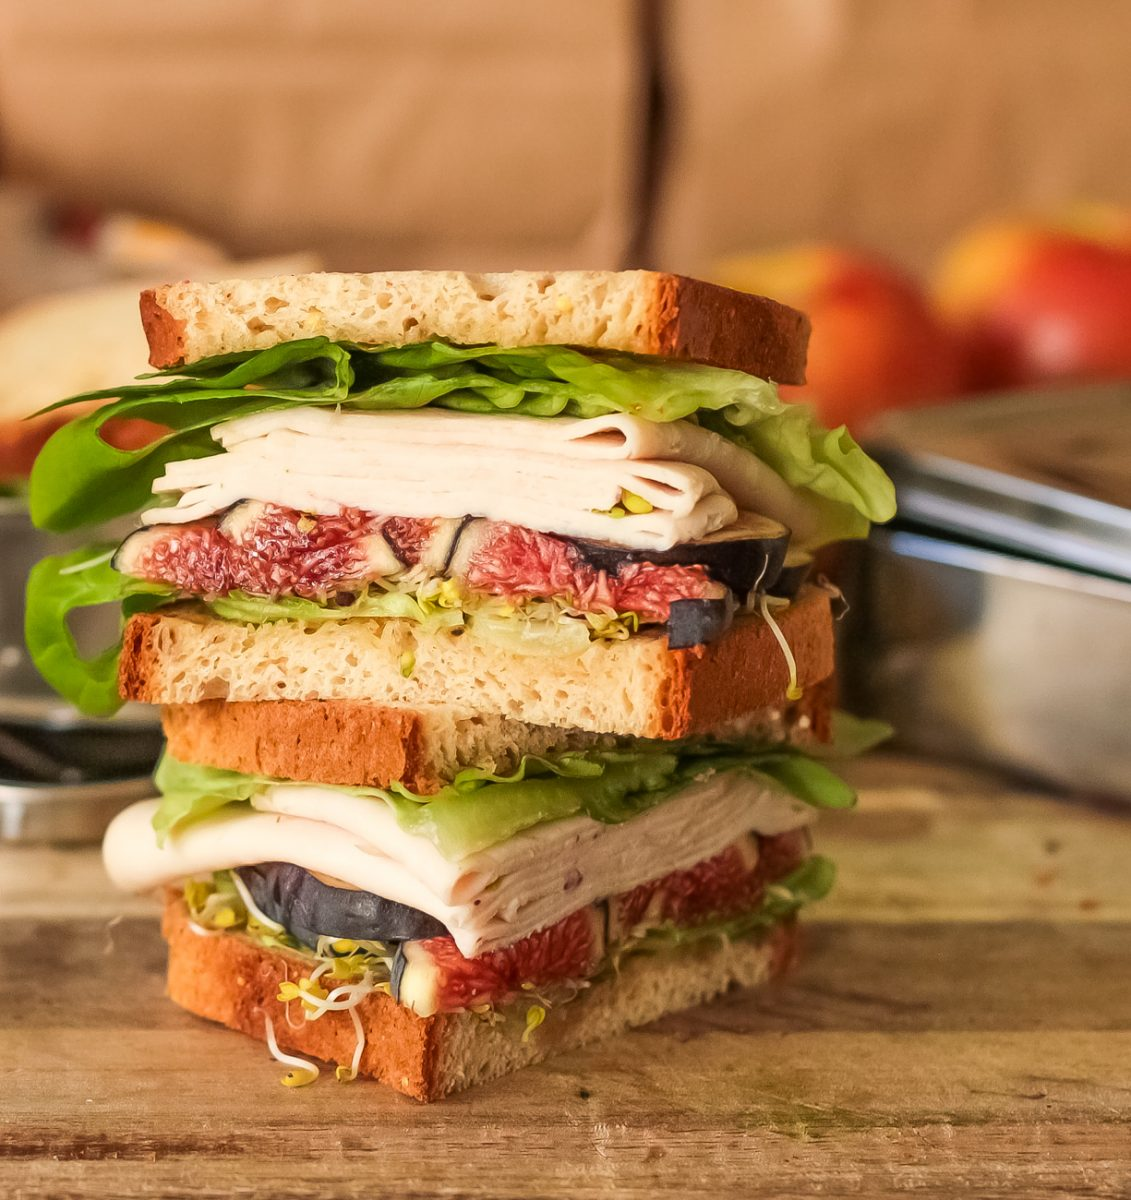 Back to School Sandwich Inspiration (gluten free, dairy free, soy free, nut free)